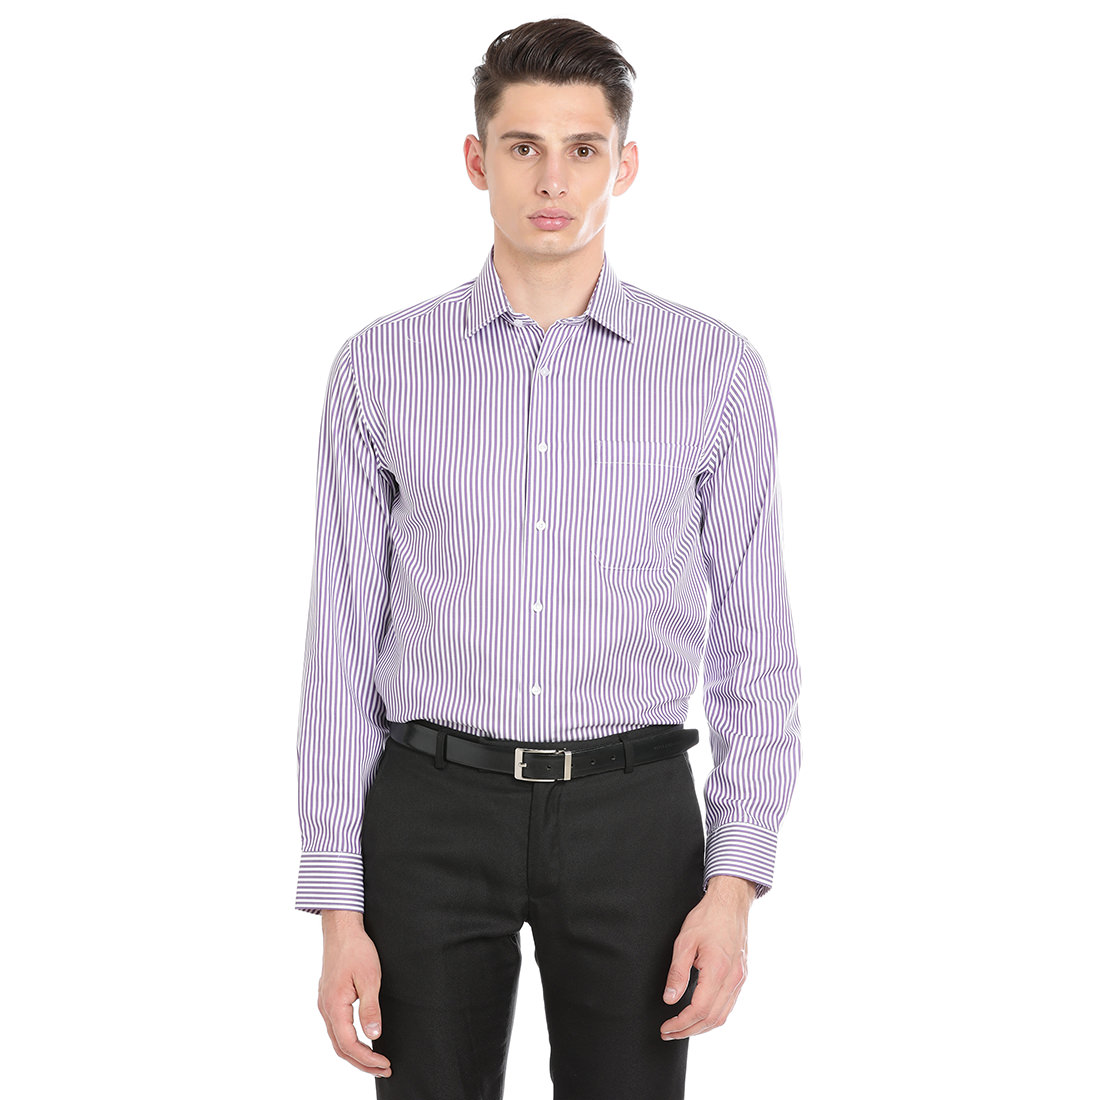 Paradigm Purple Color Formal Pure Cotton Non-Iron Shirt